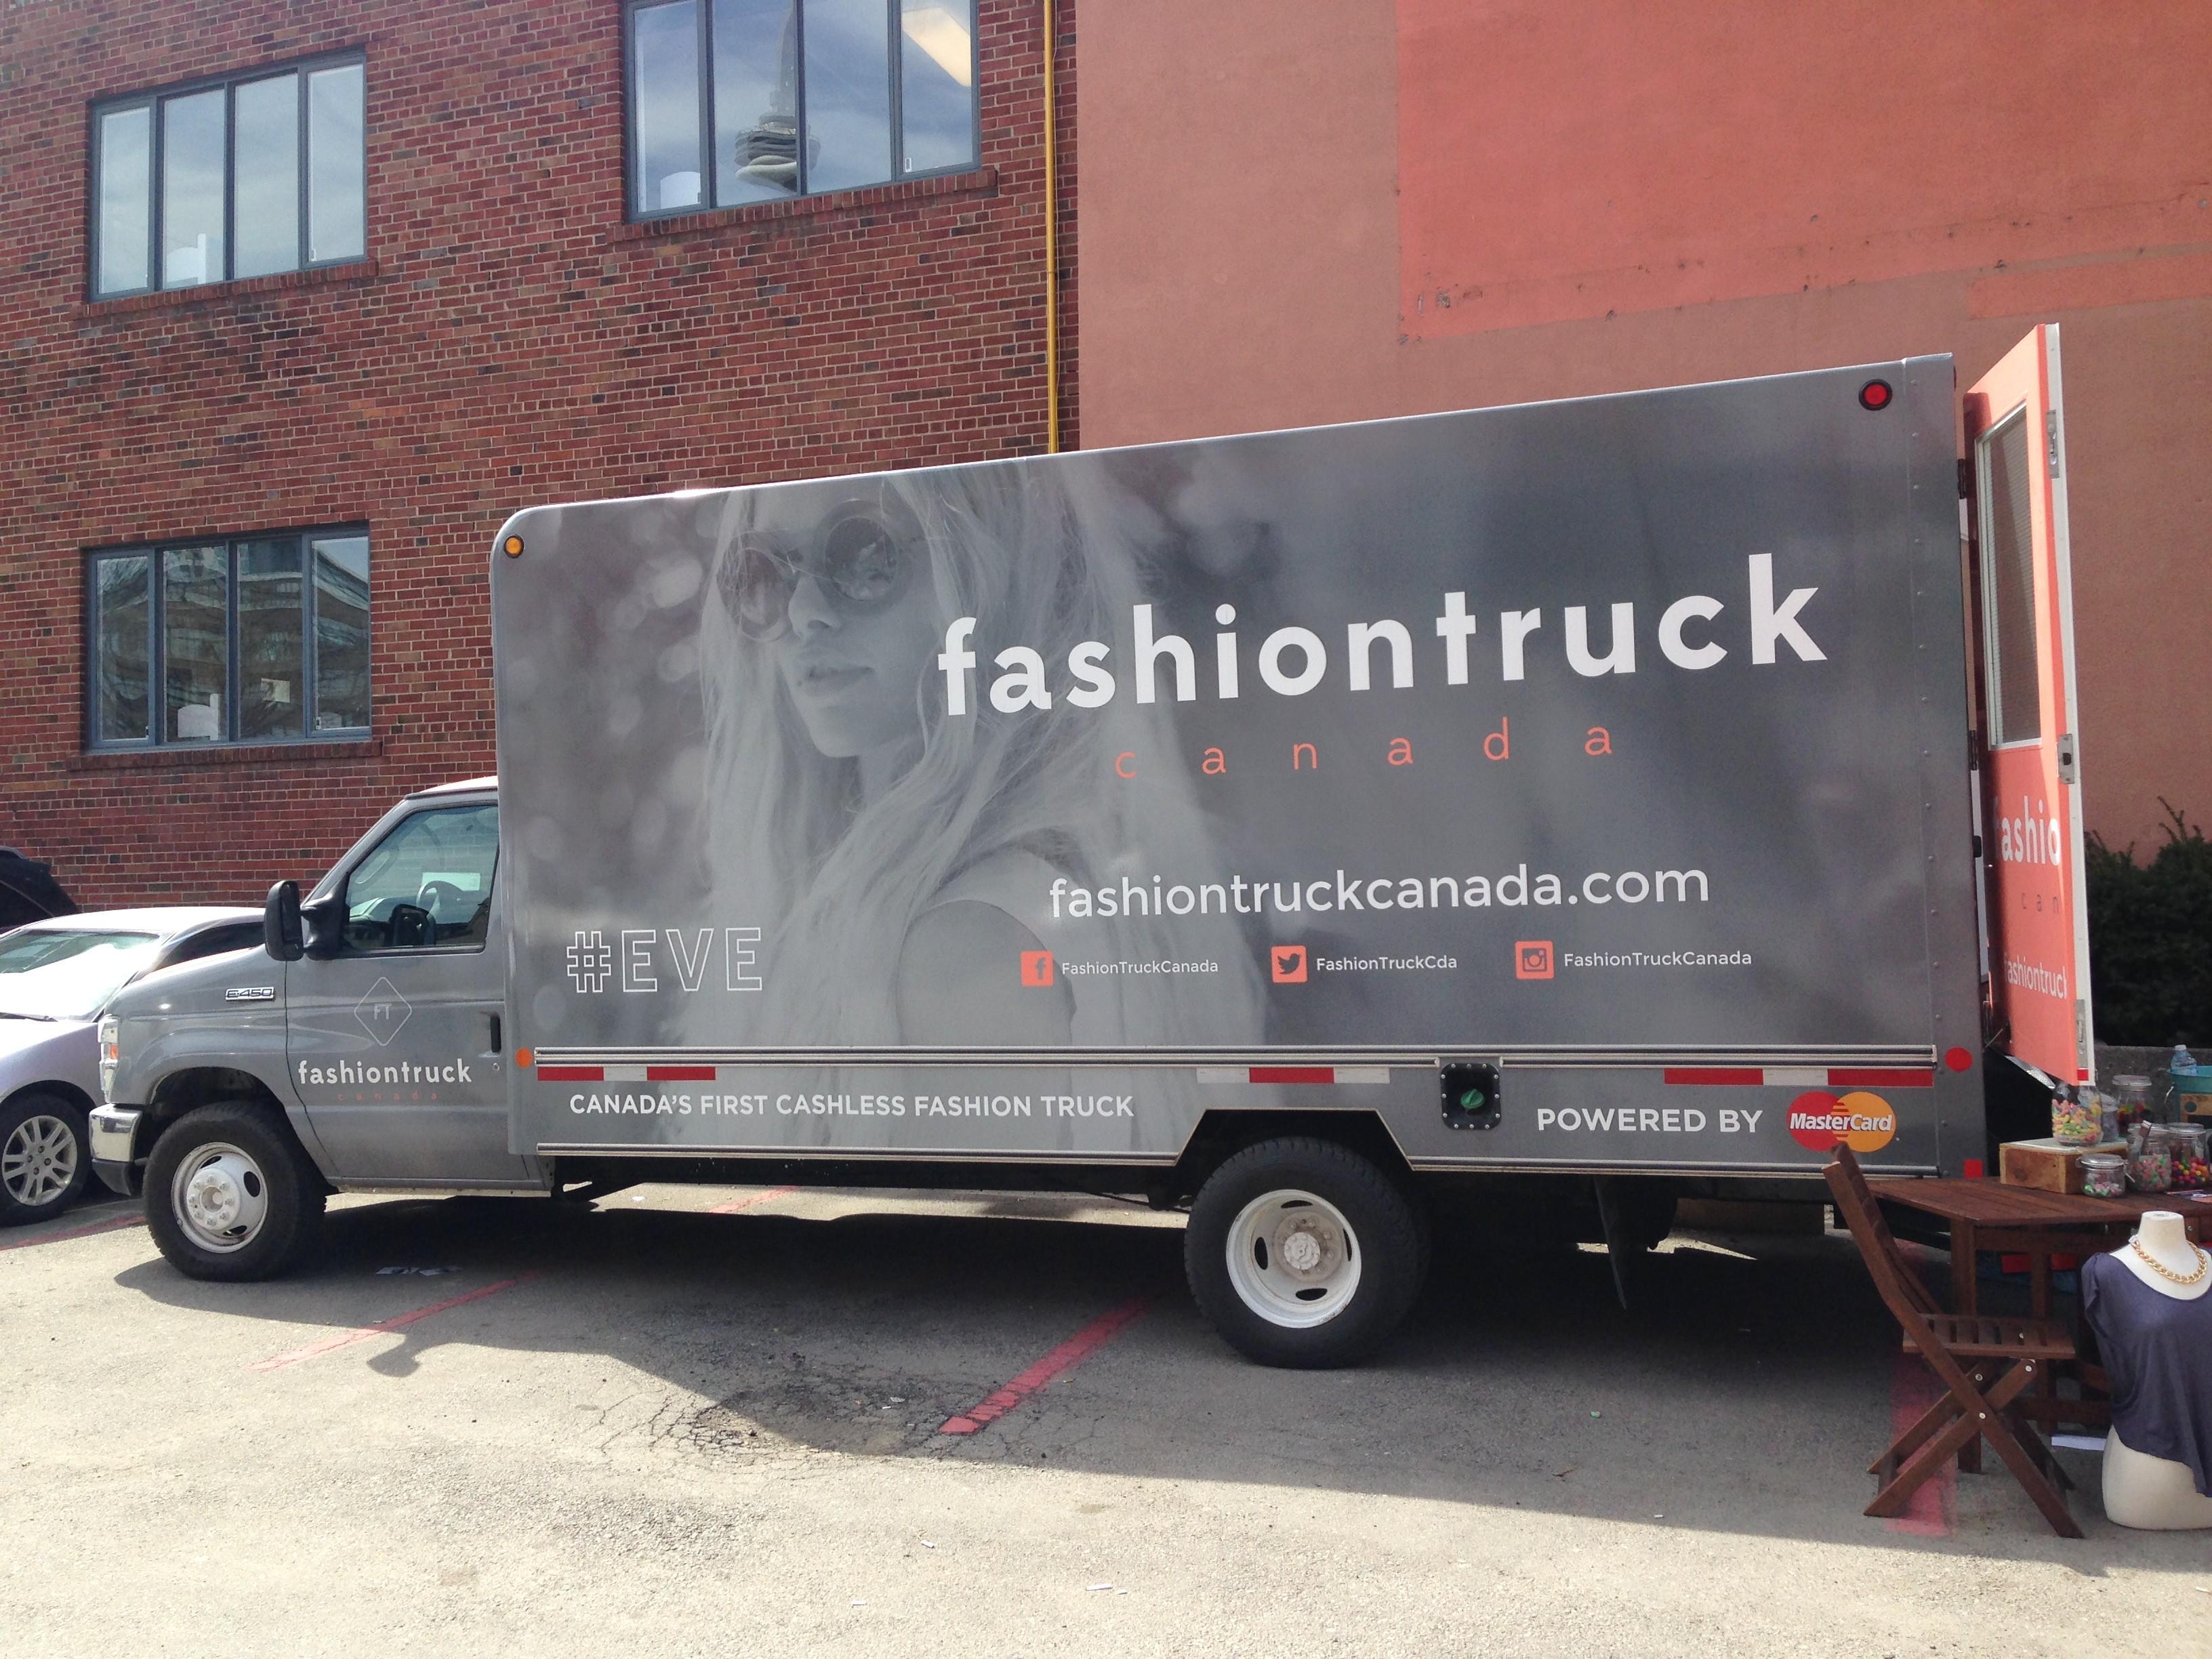 fashiontruck canada